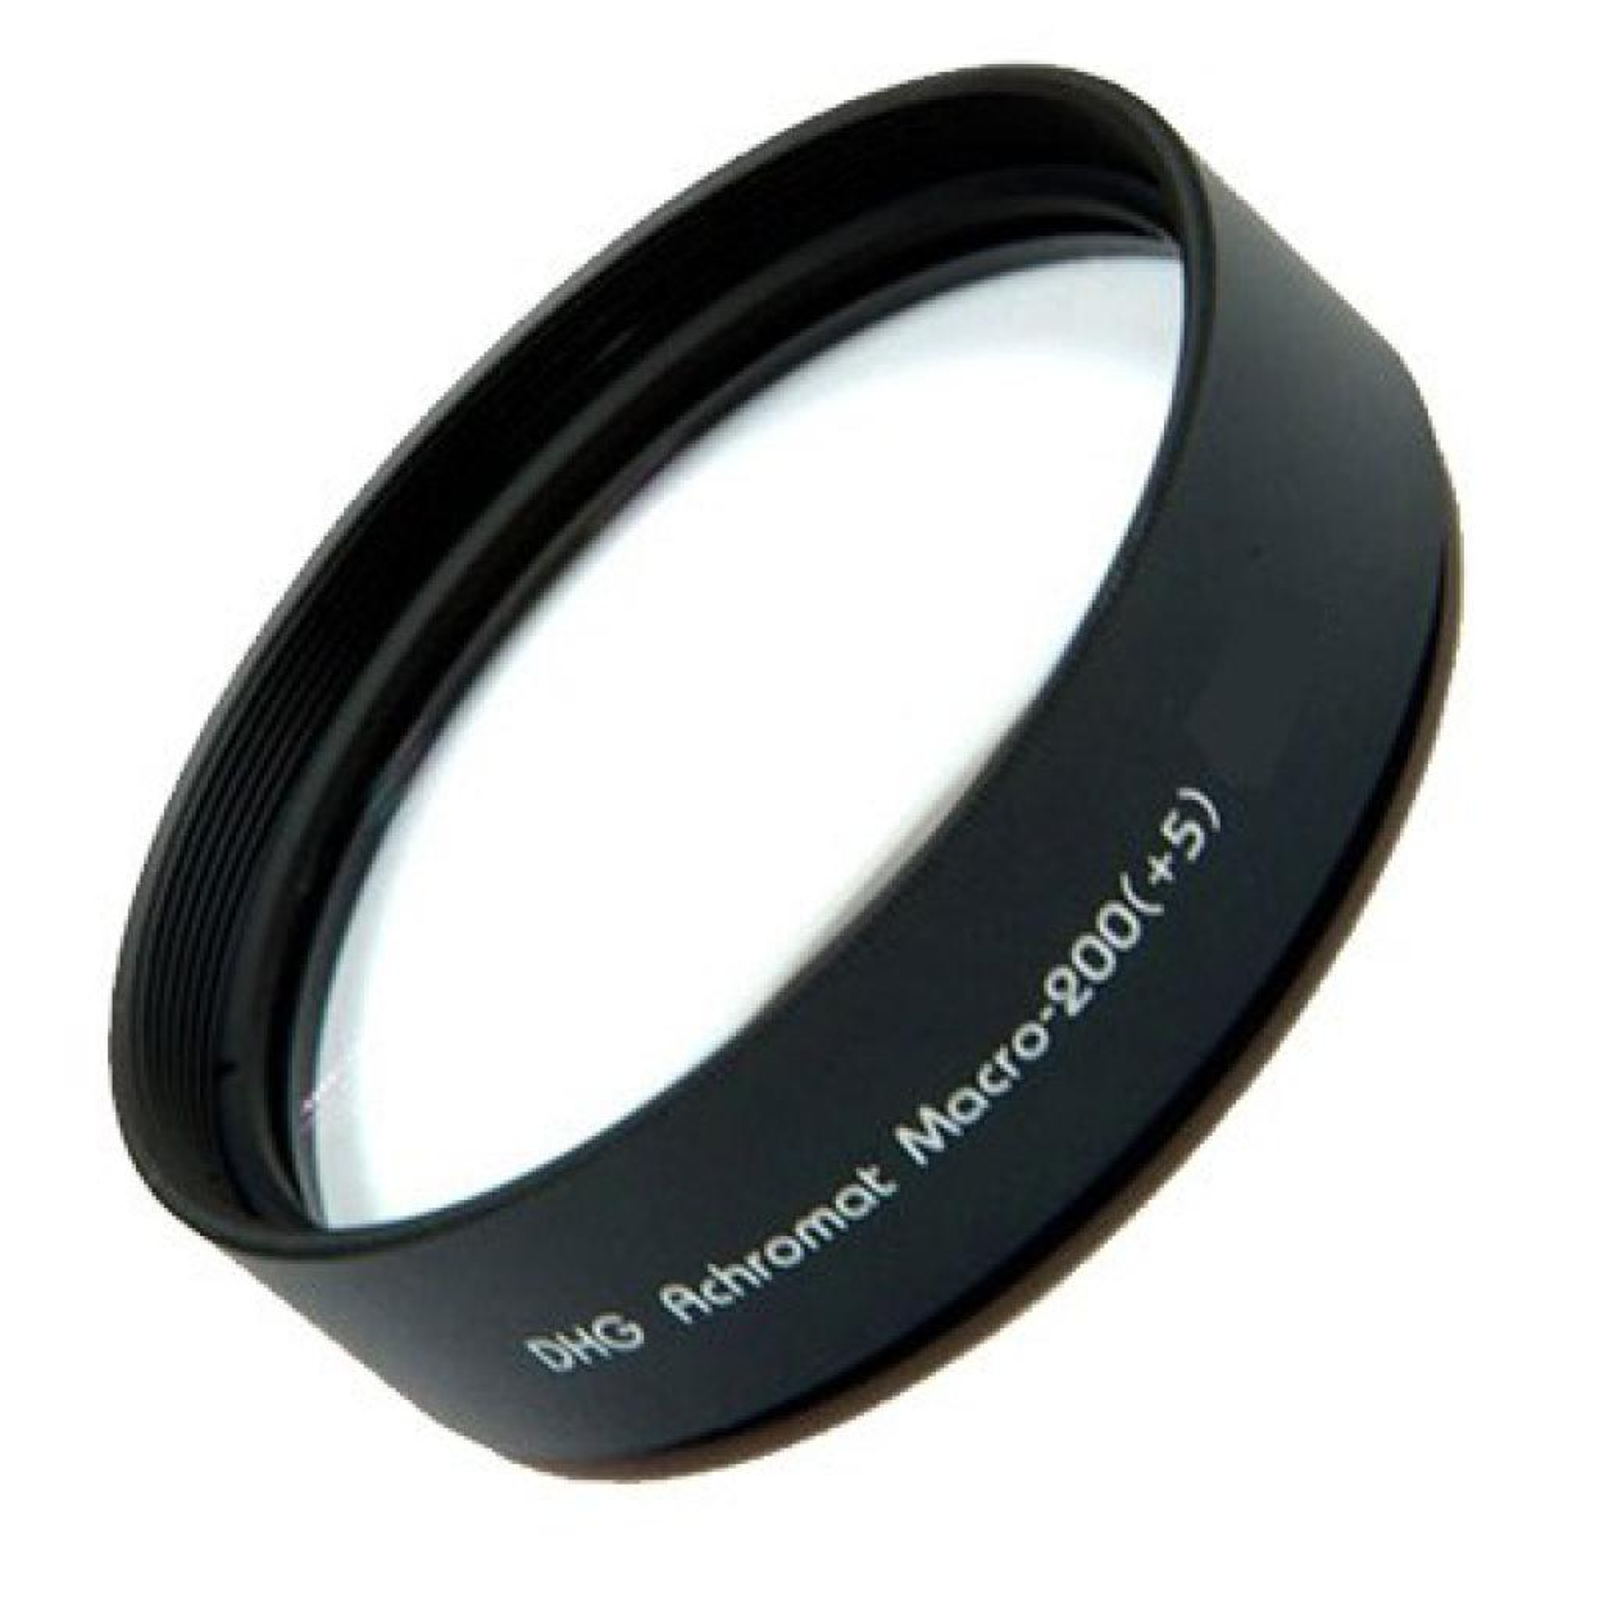 Светофильтр Marumi DHG Achromat Macro-200(+5) 58mm